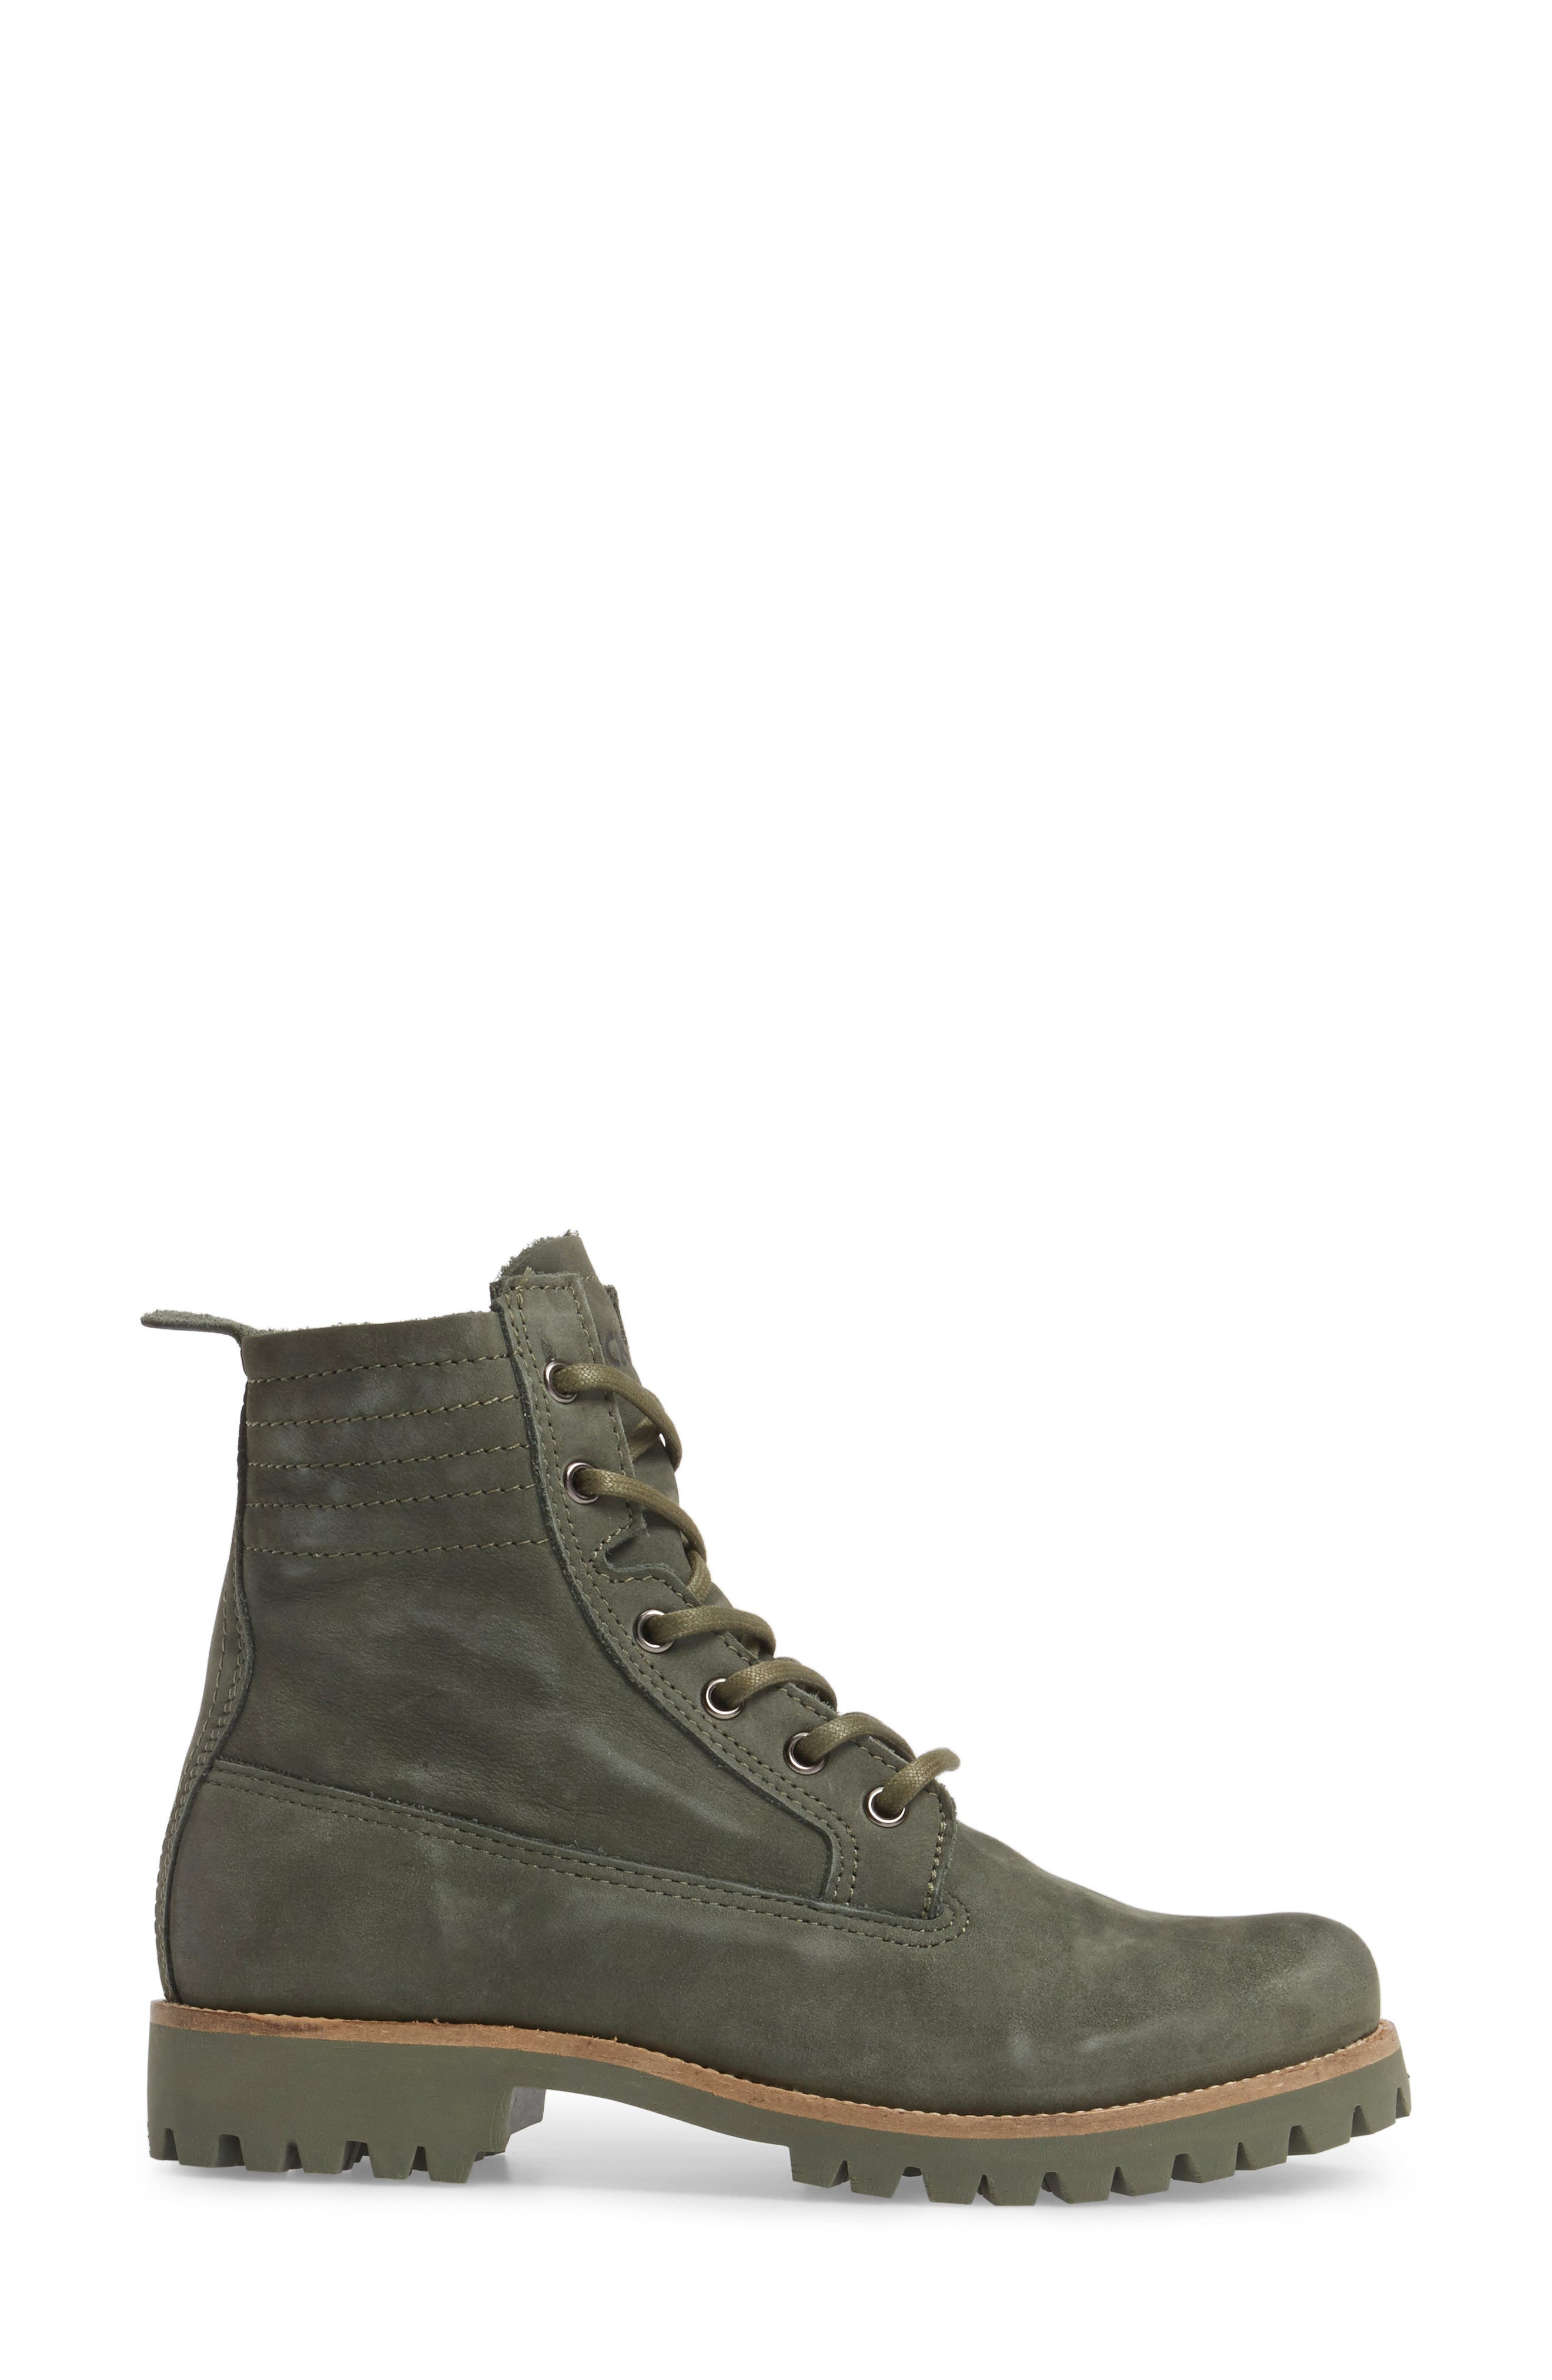 OL23 Lace-Up Boot,                             Alternate thumbnail 3, color,                             Dark Green Nubuck